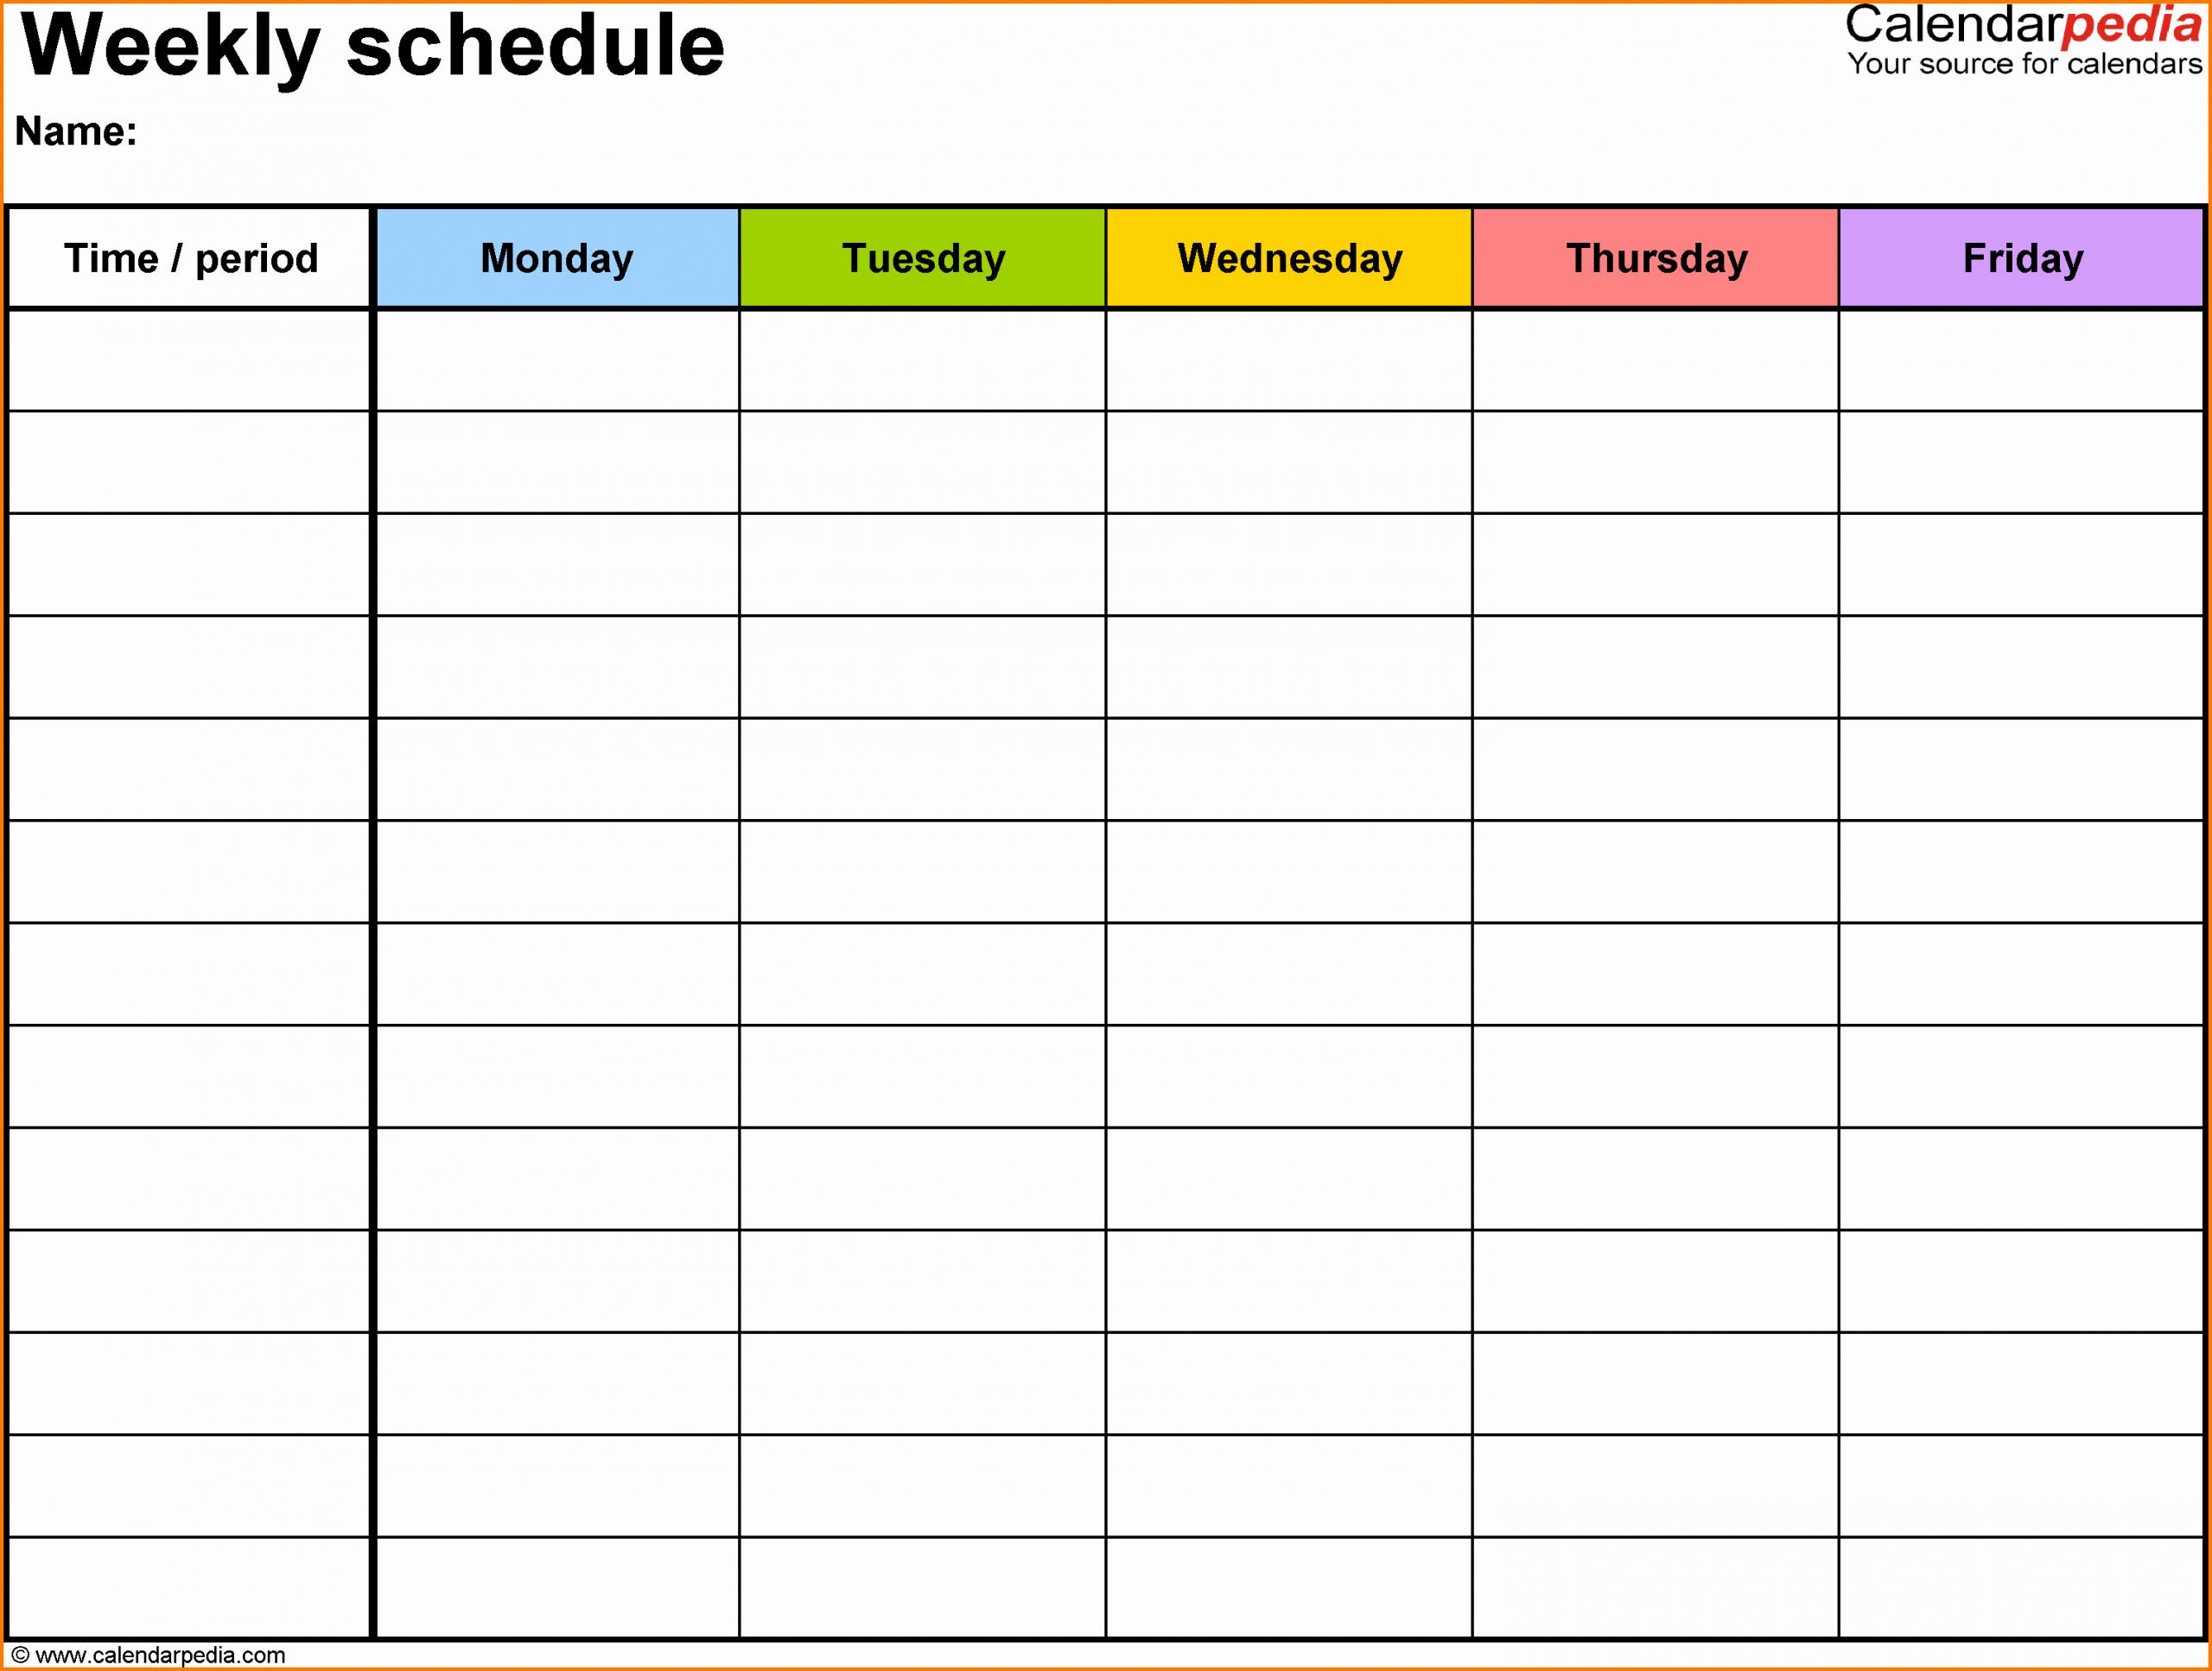 Class Schedule Template Online New Weekly Class Schedule Template